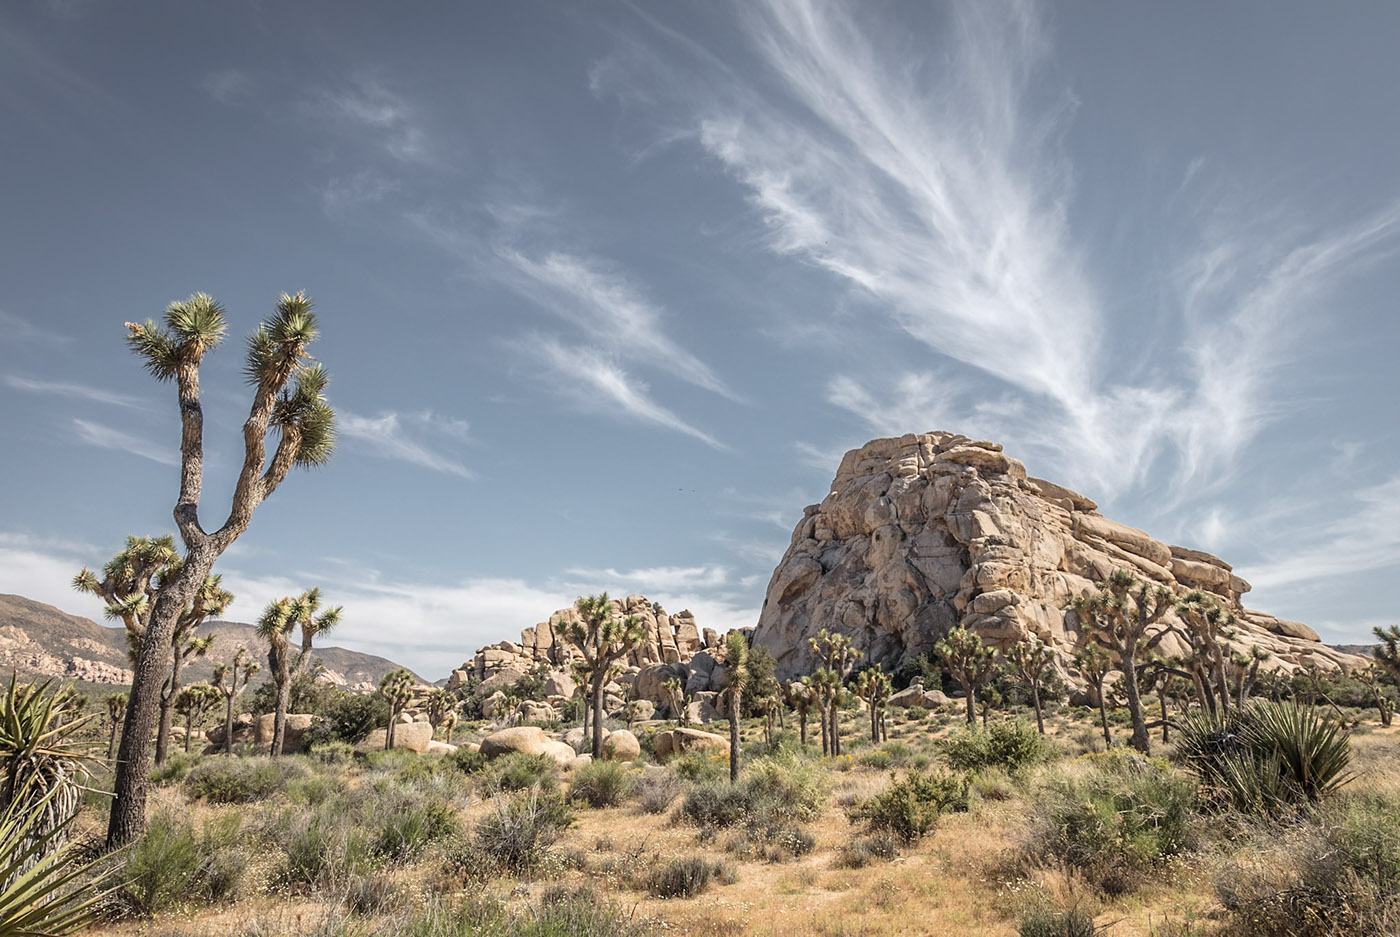 joshua tree state park cactus California Ocotillo Patch Cholla Cactus Jumbo Rocks hidden valley quail springs Park Boulevard